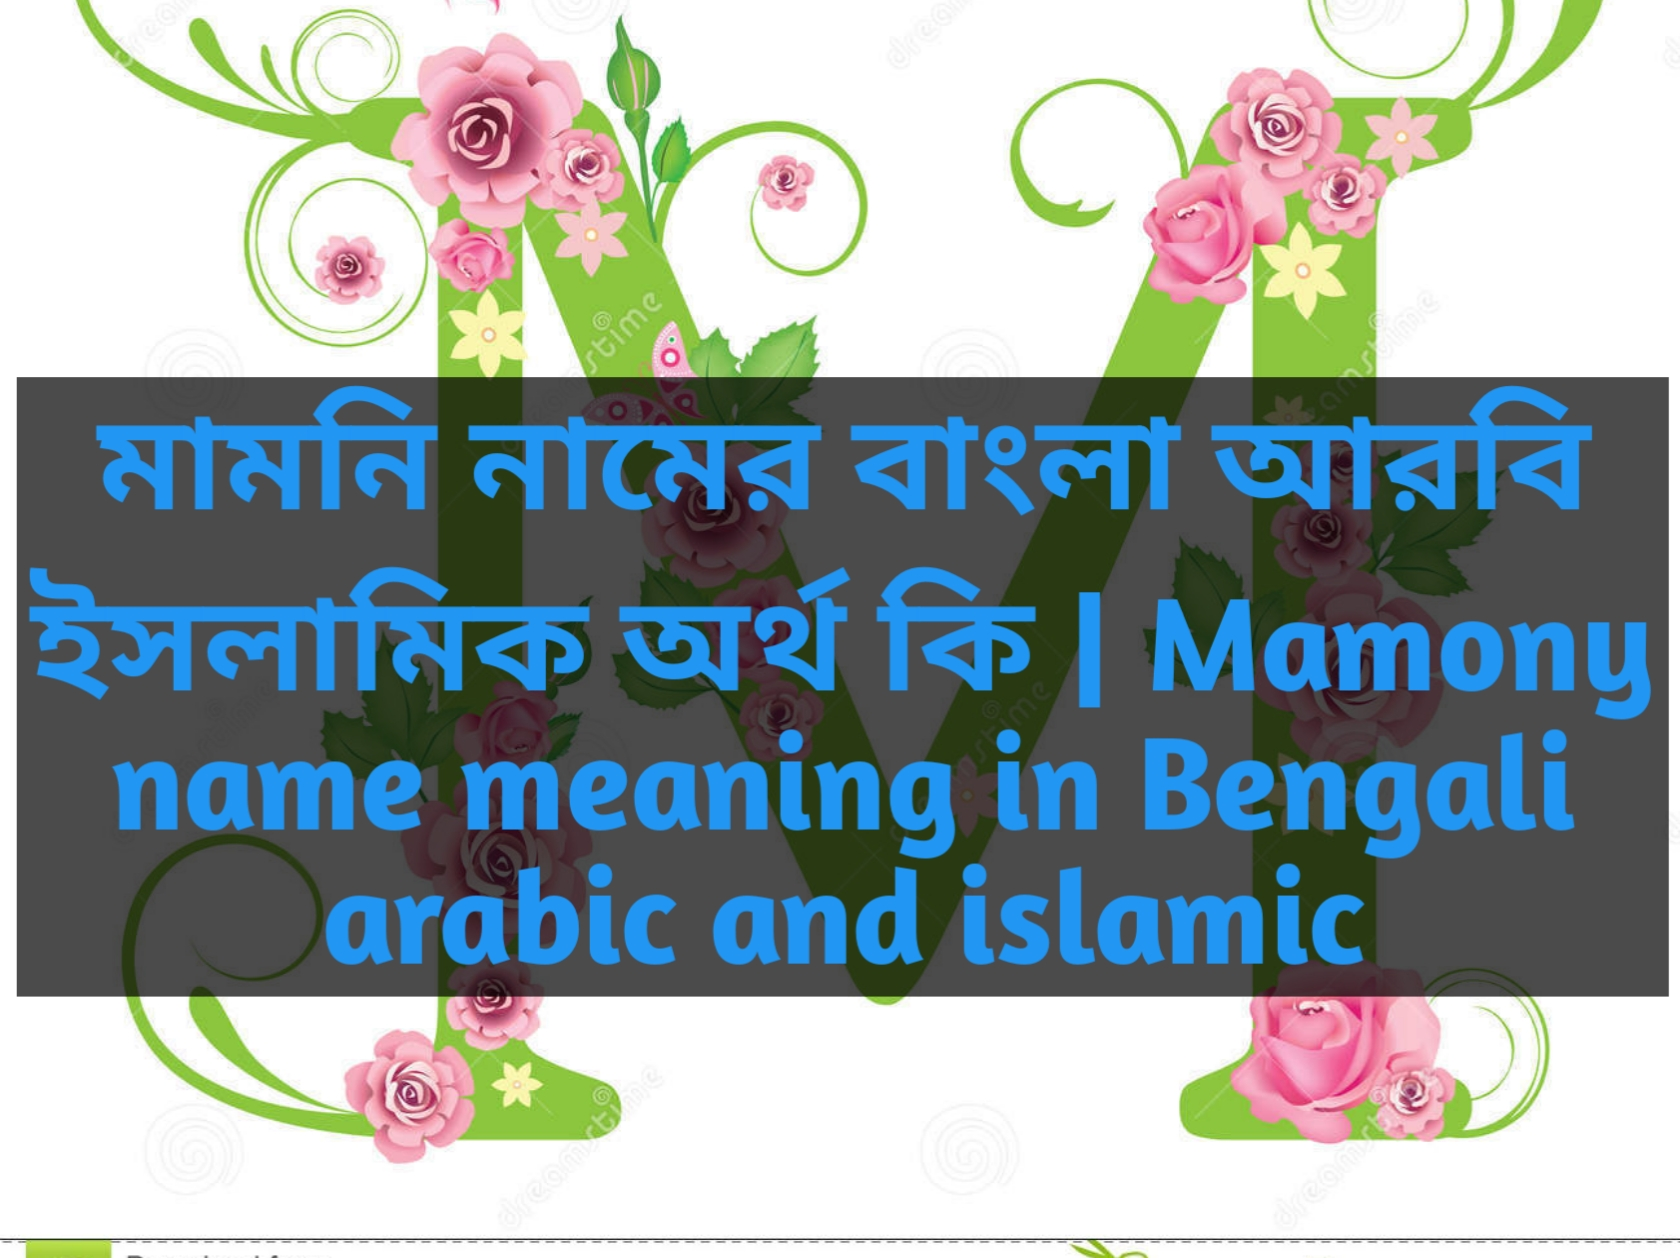 Mamony name meaning in Bengali, মামনি নামের অর্থ কি, মামনি নামের বাংলা অর্থ কি, মামনি নামের ইসলামিক অর্থ কি,